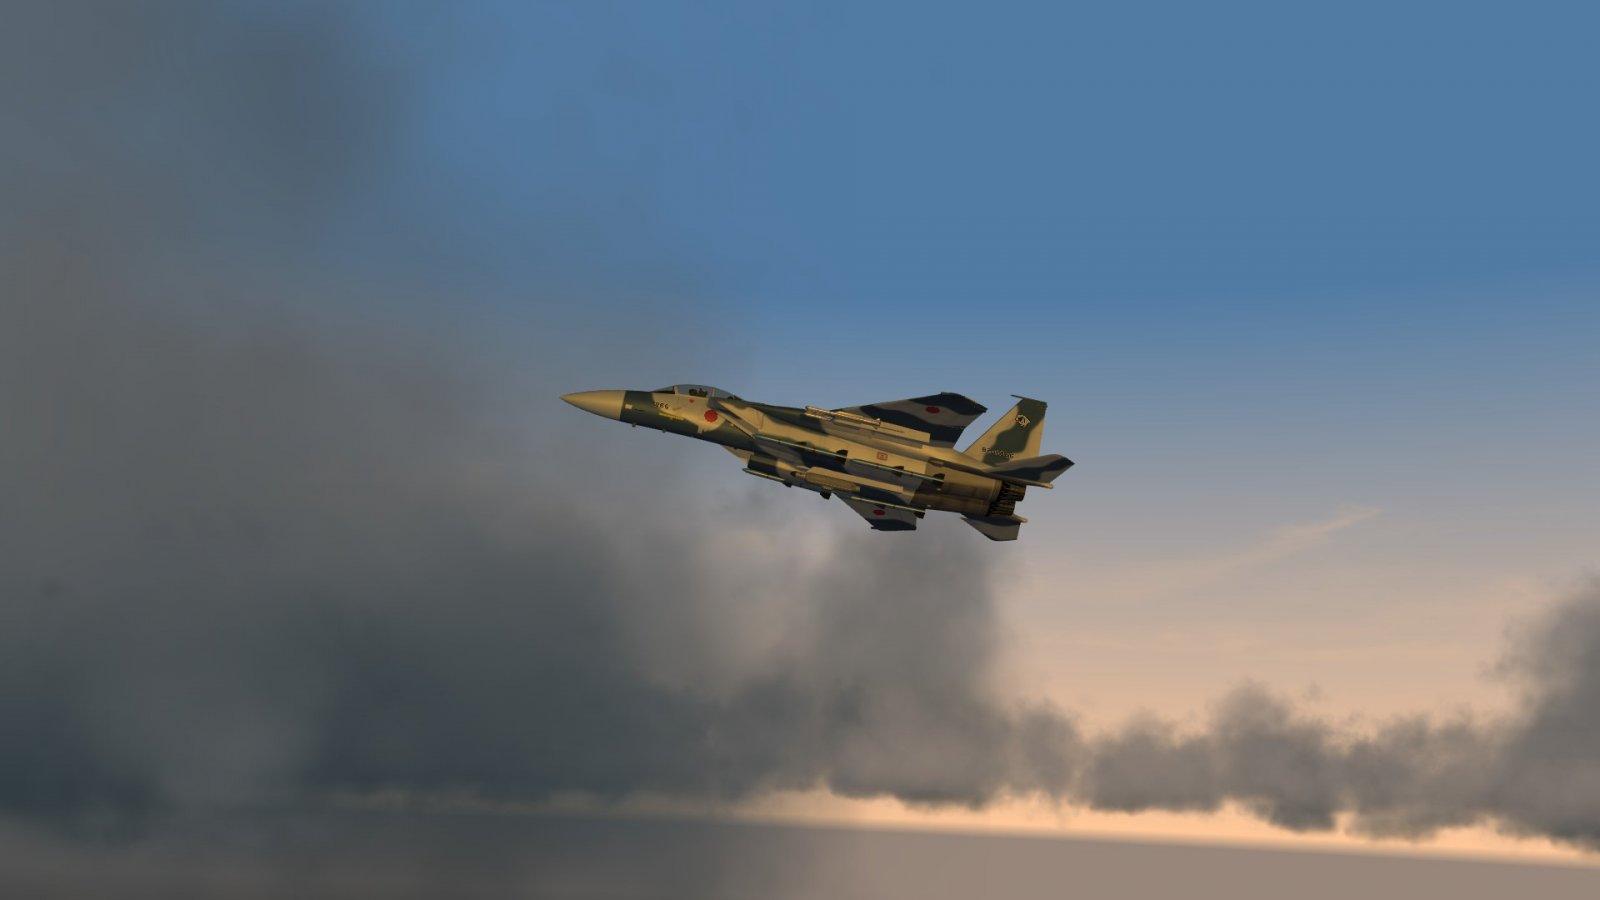 Aggressor F-15DJ in the Sunset & Clouds